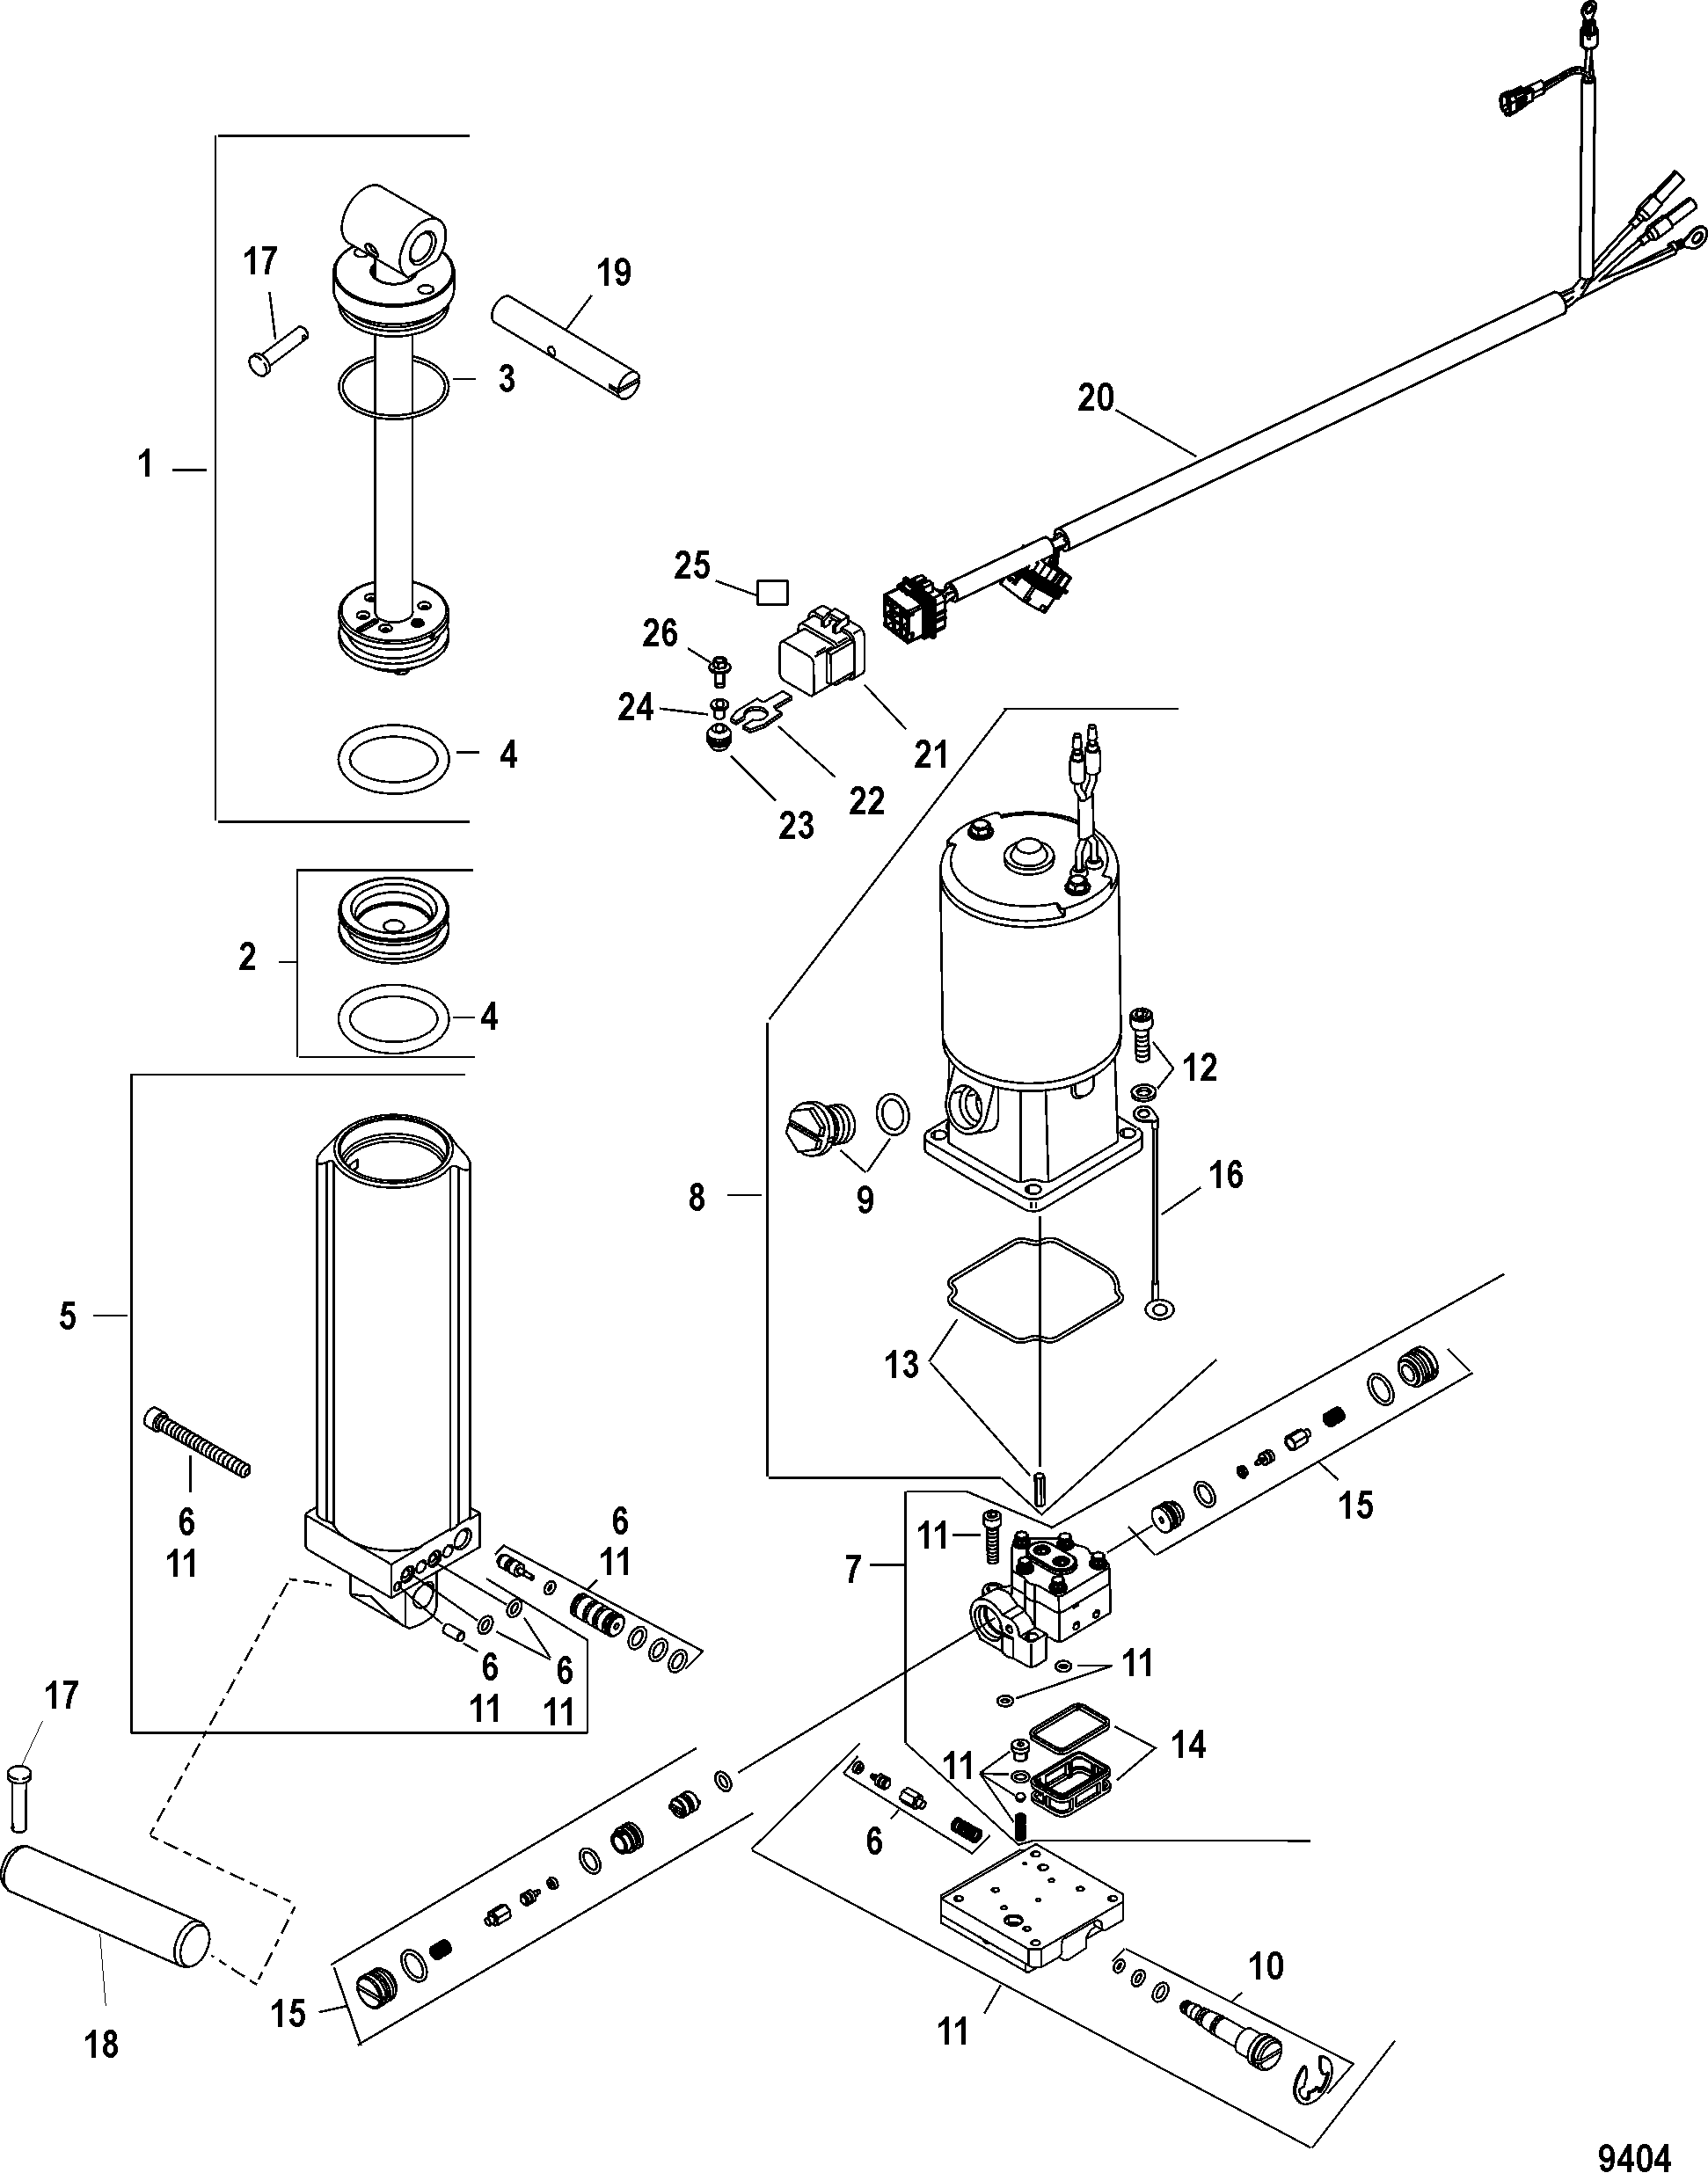 90 Hp Mercury 4 Stroke Efi Electrical Diagram